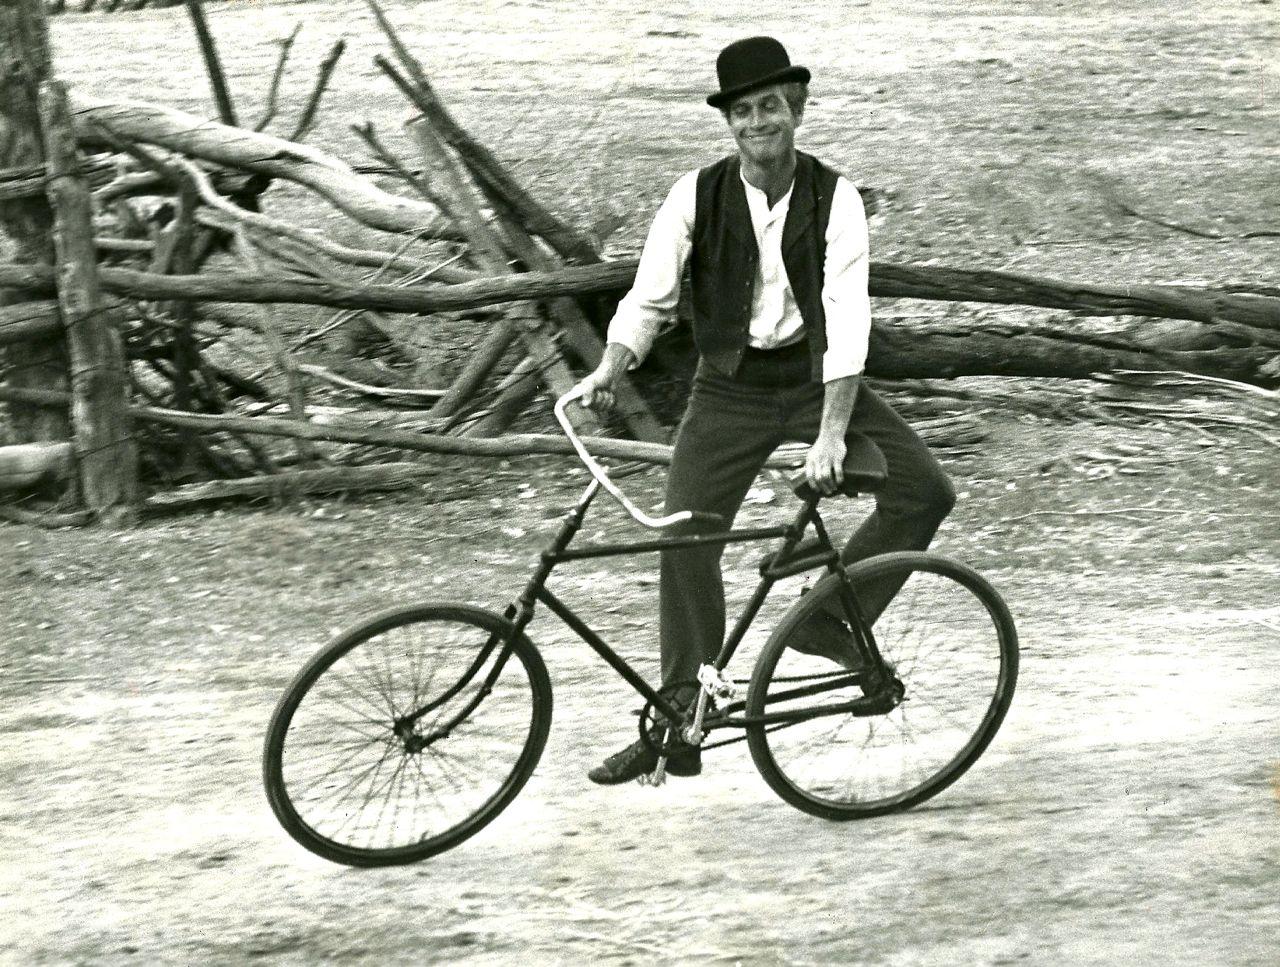 Paul Newman monta en bici de lado (1969)